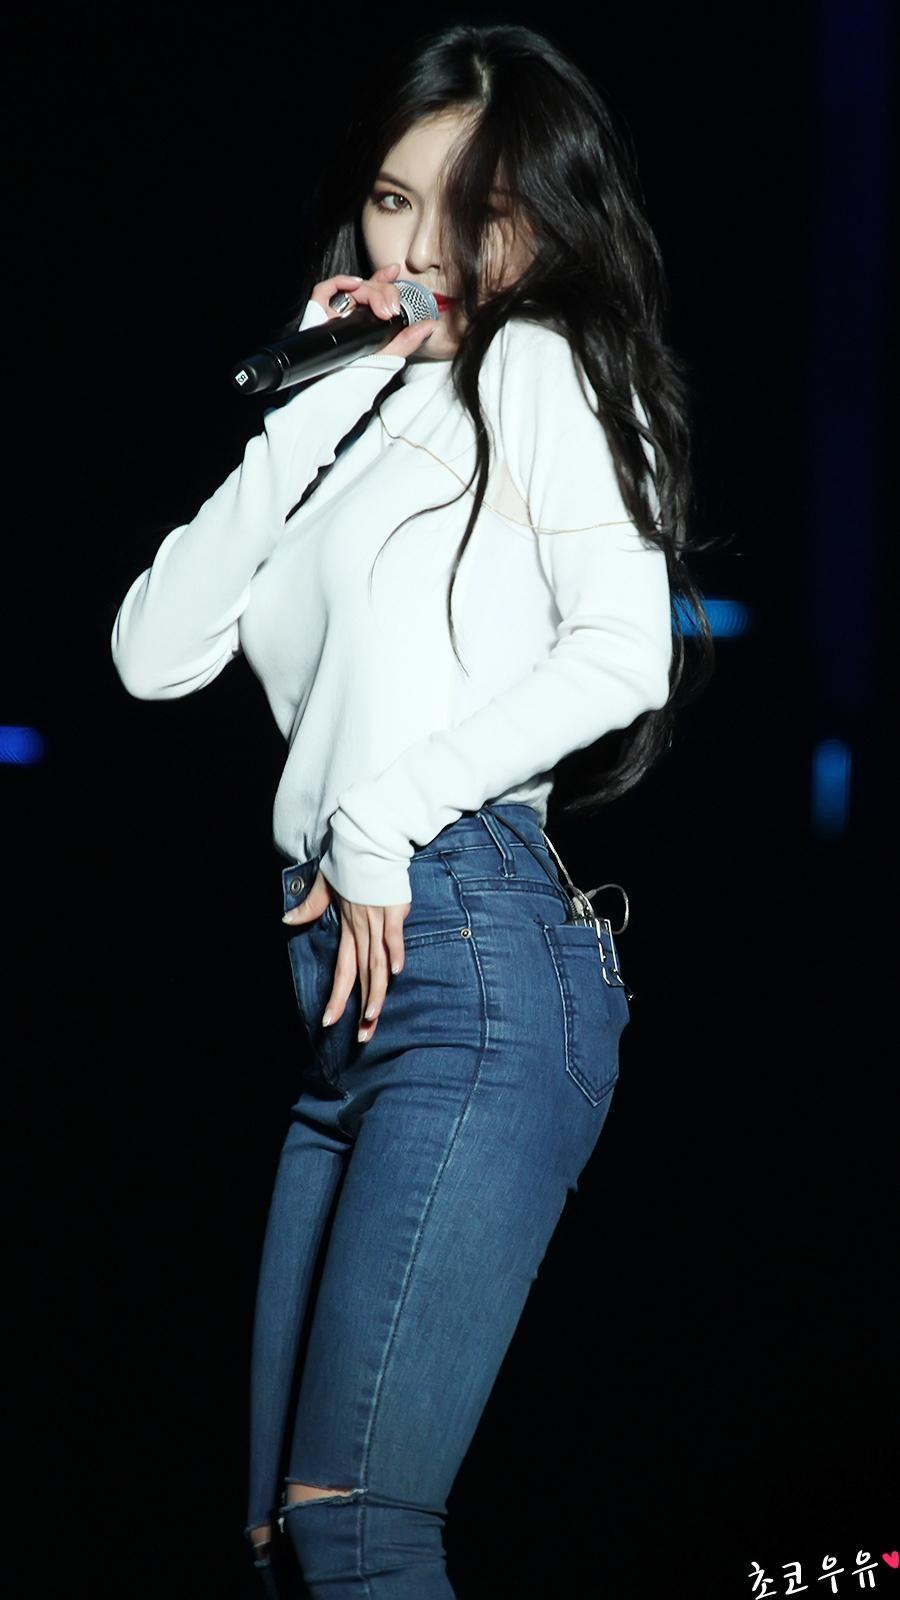 Kim Hyuna | Fashion, Girl body, Women's top